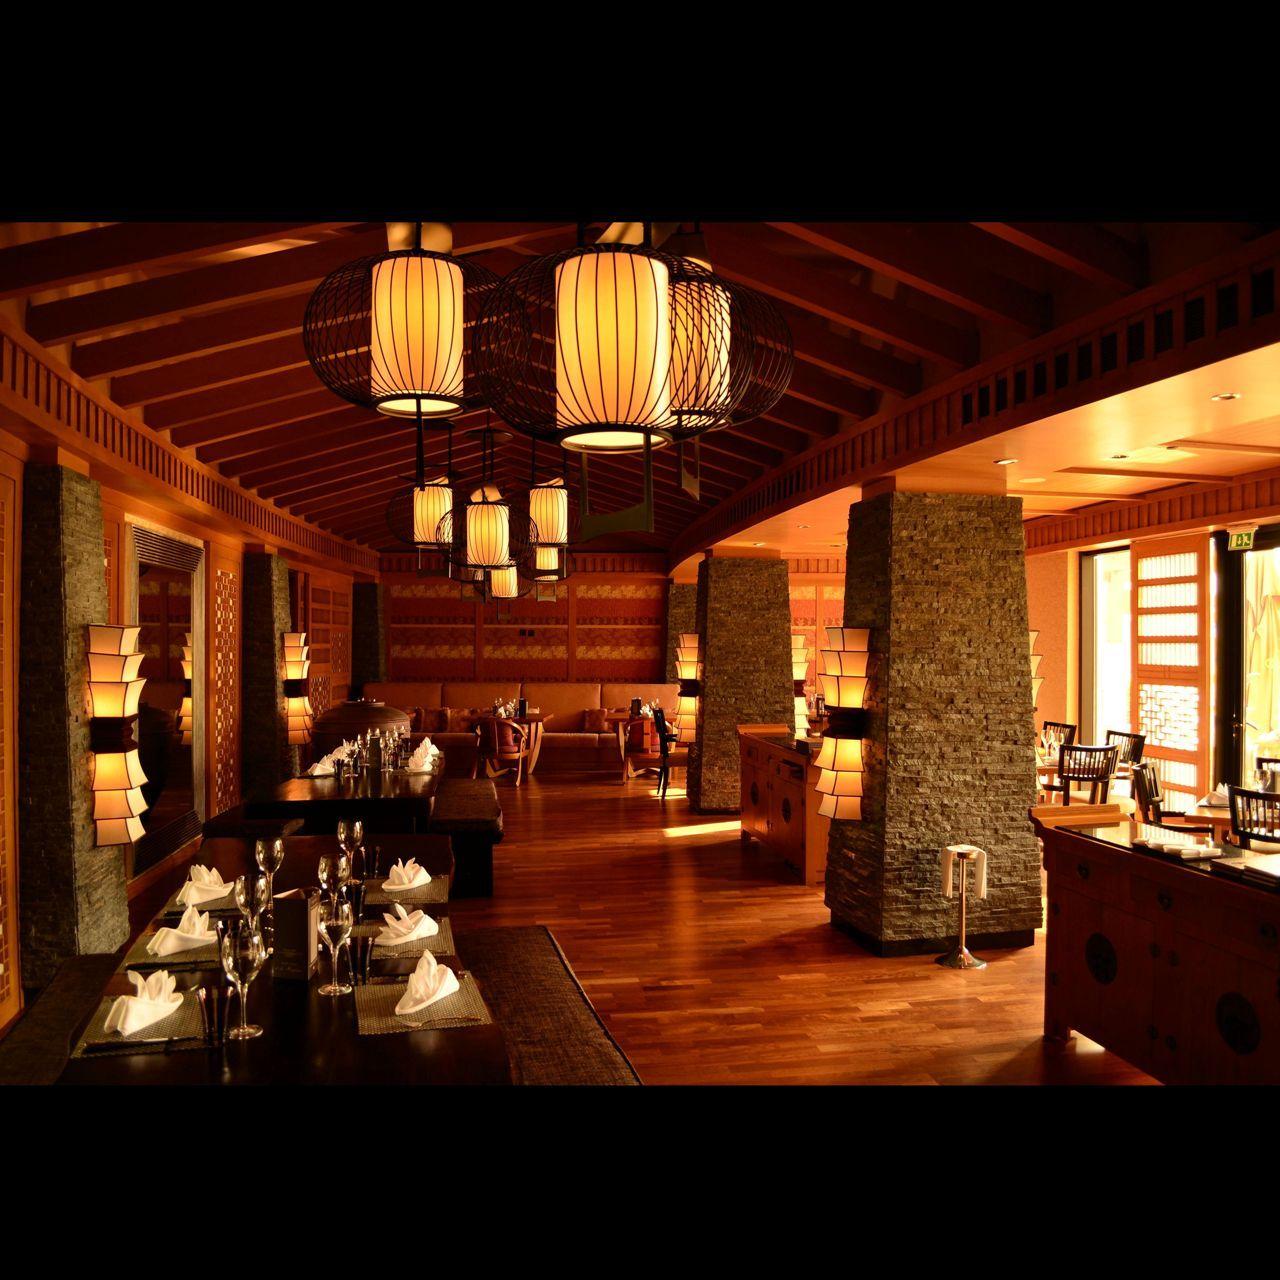 Wok Restaurant - Sydøstasiatiske restauranter i Sofitel-1310